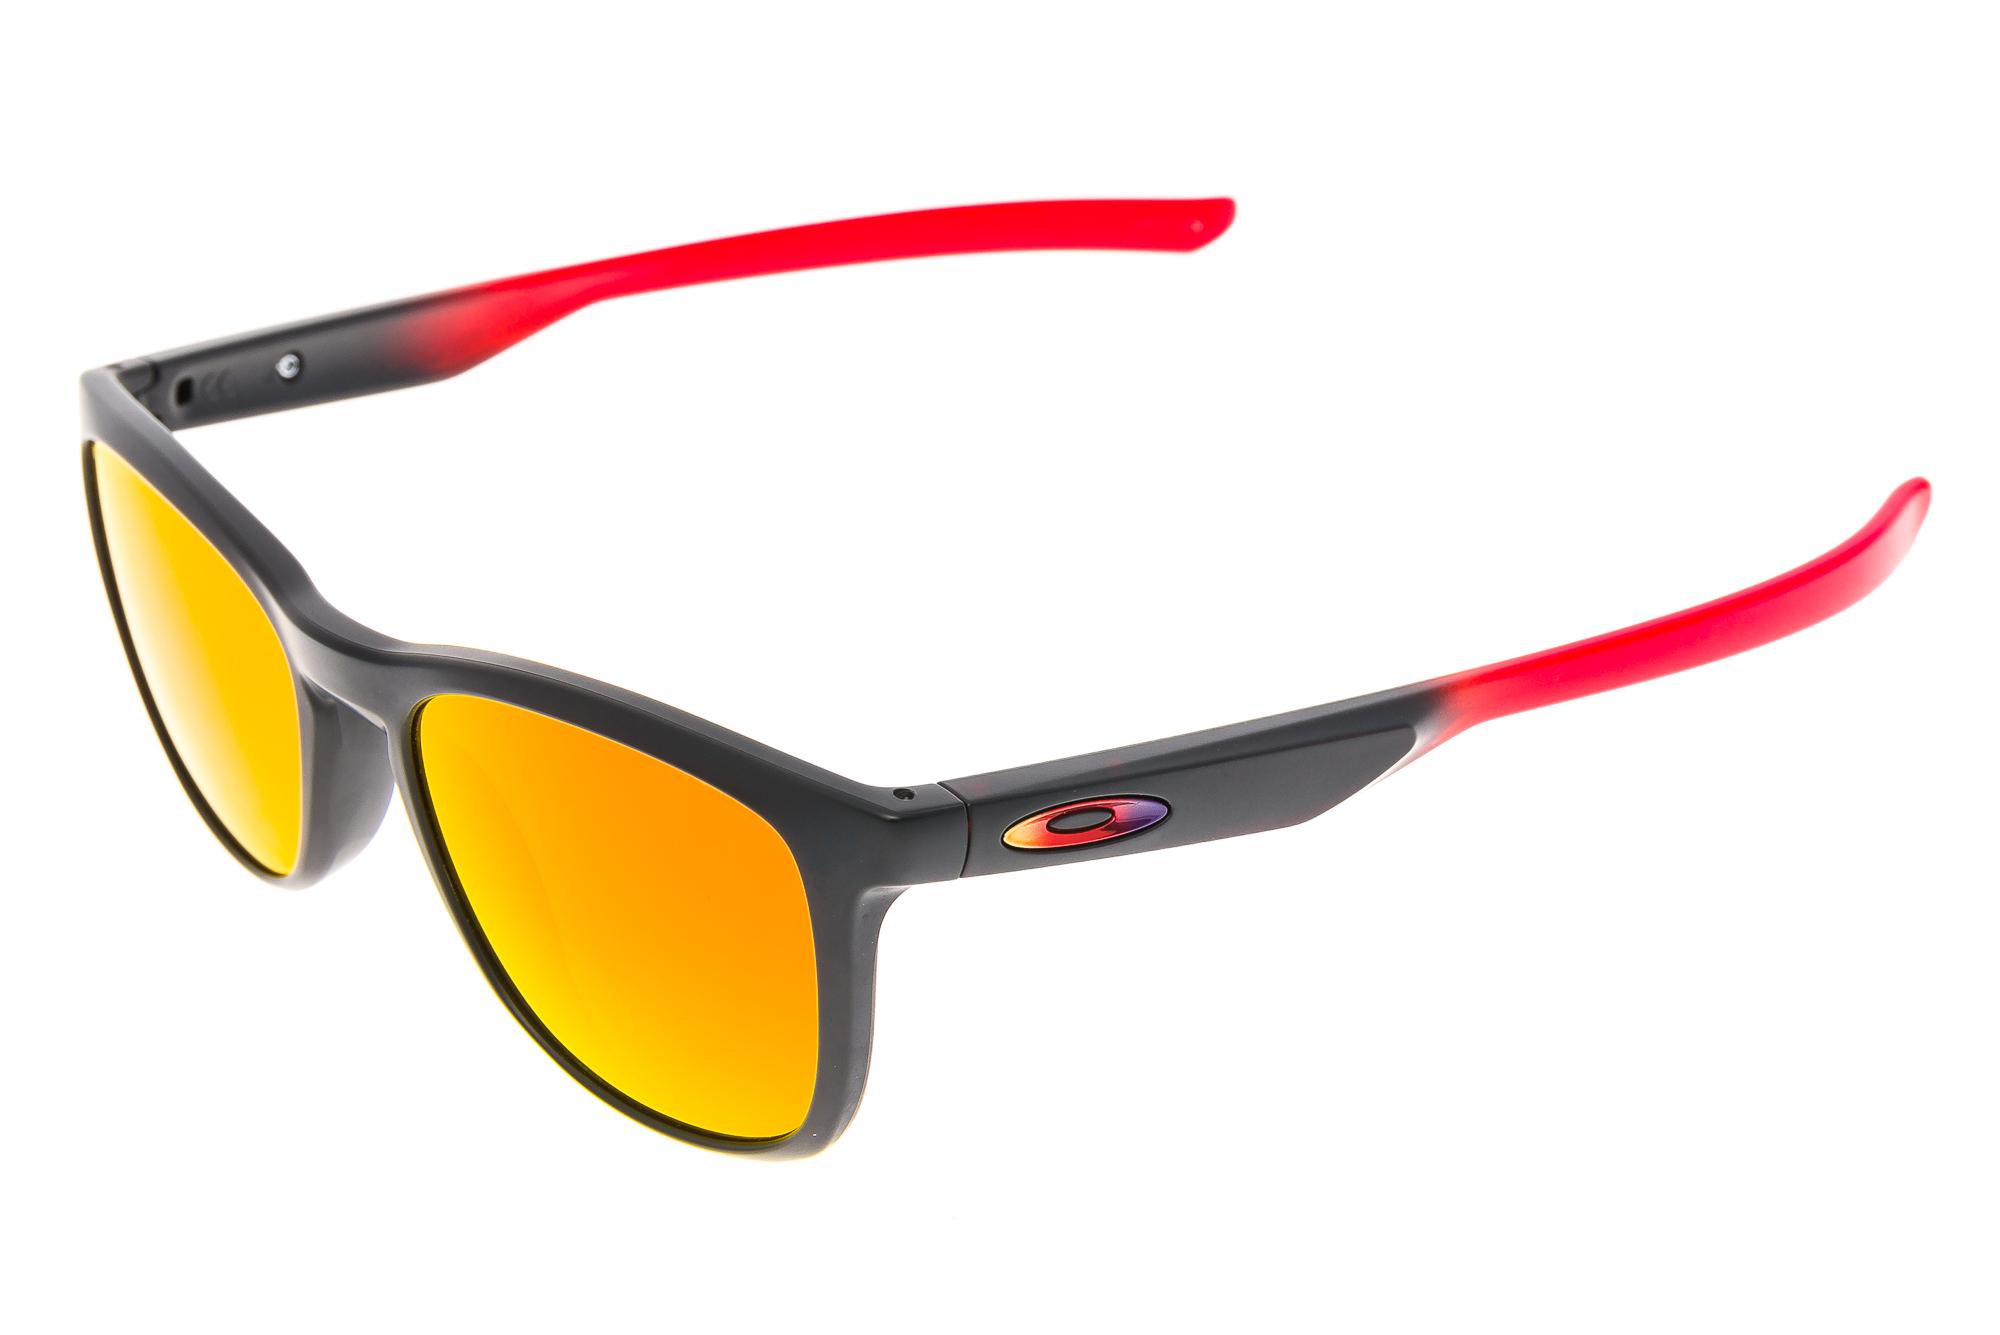 105db09b606 Details about Oakley Trillbe X Sunglasses Black Red Frame Prizm Lens